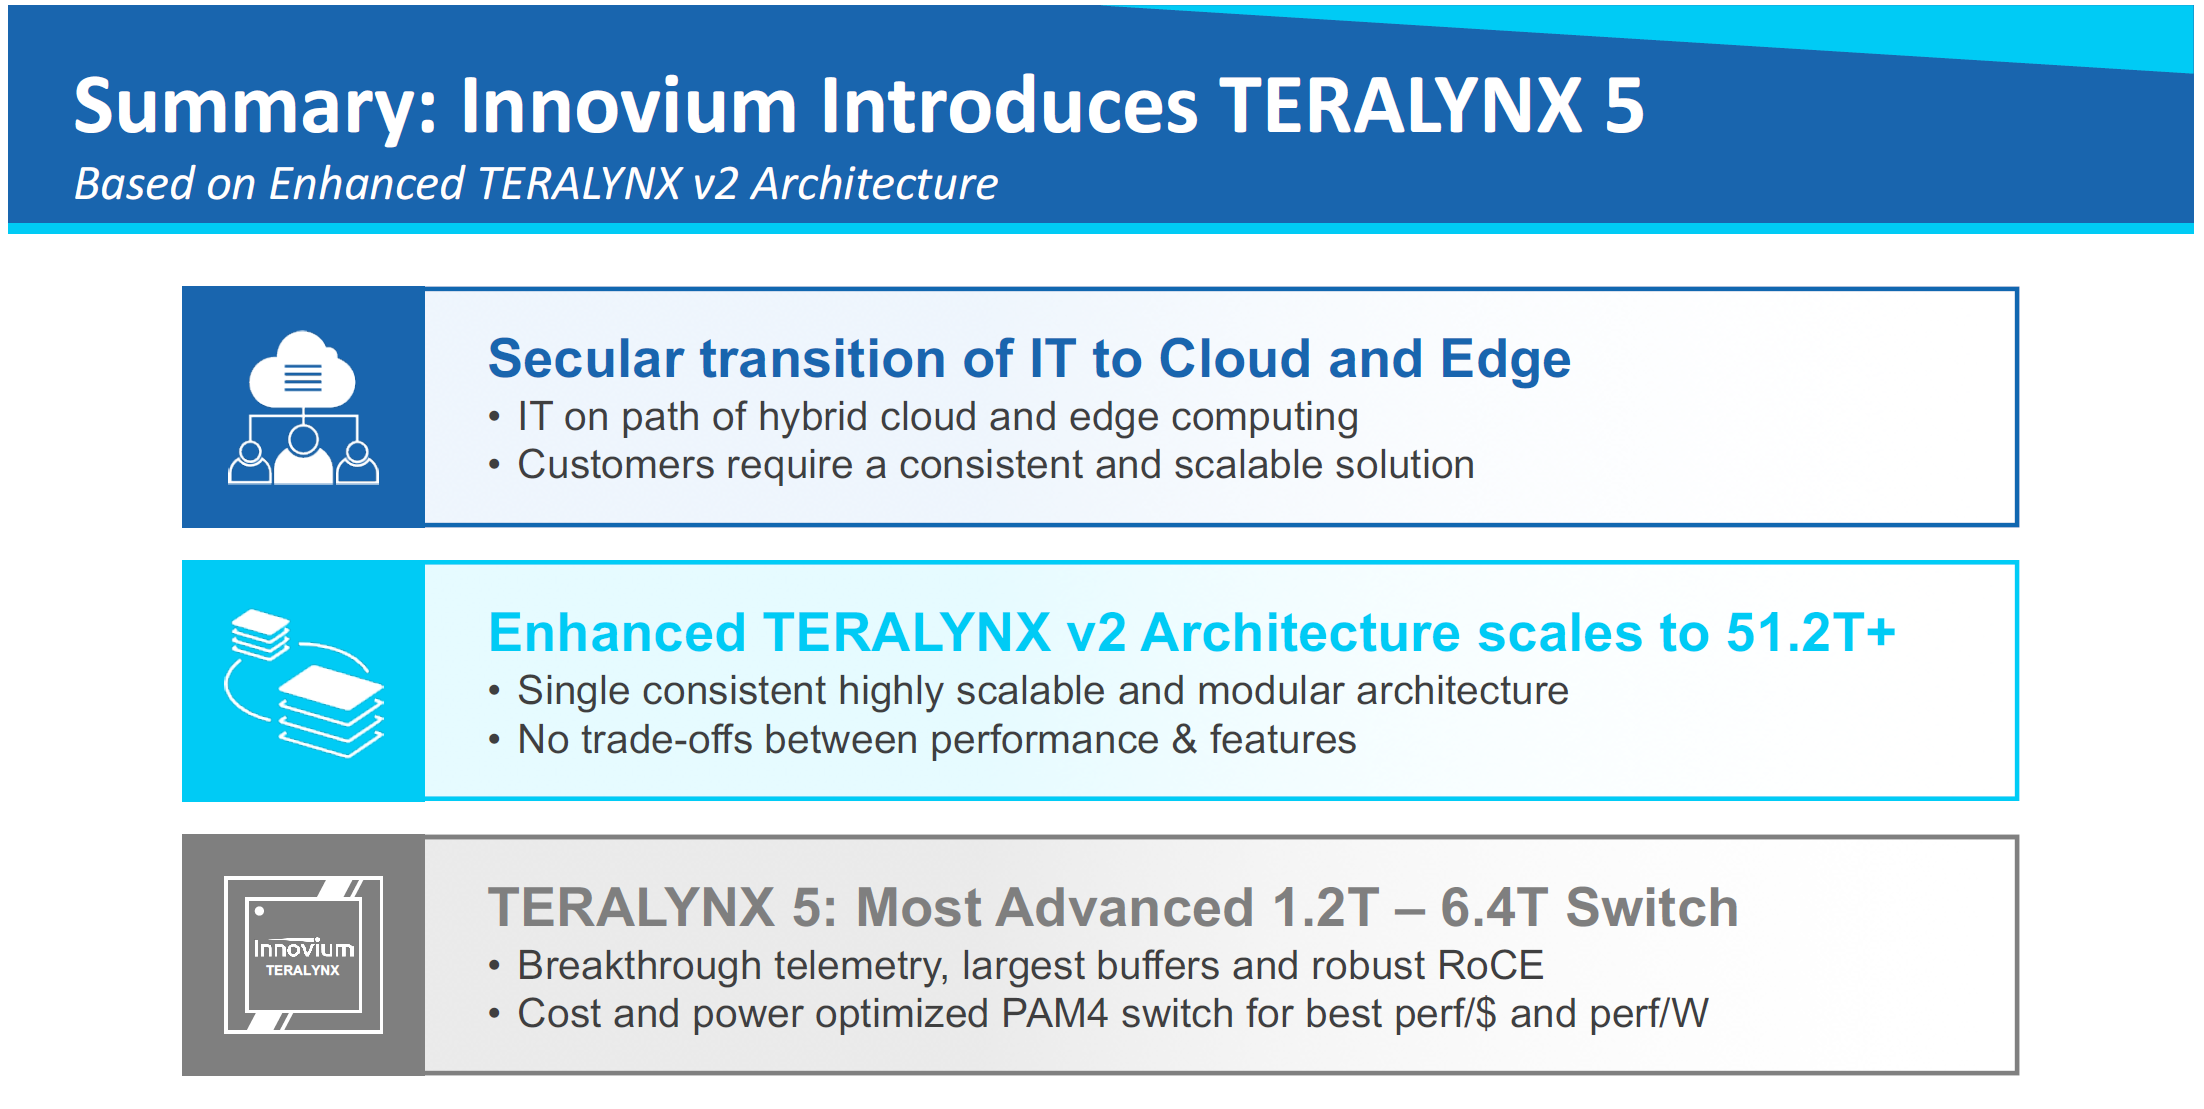 Innovium TERALYNX 5 Summary